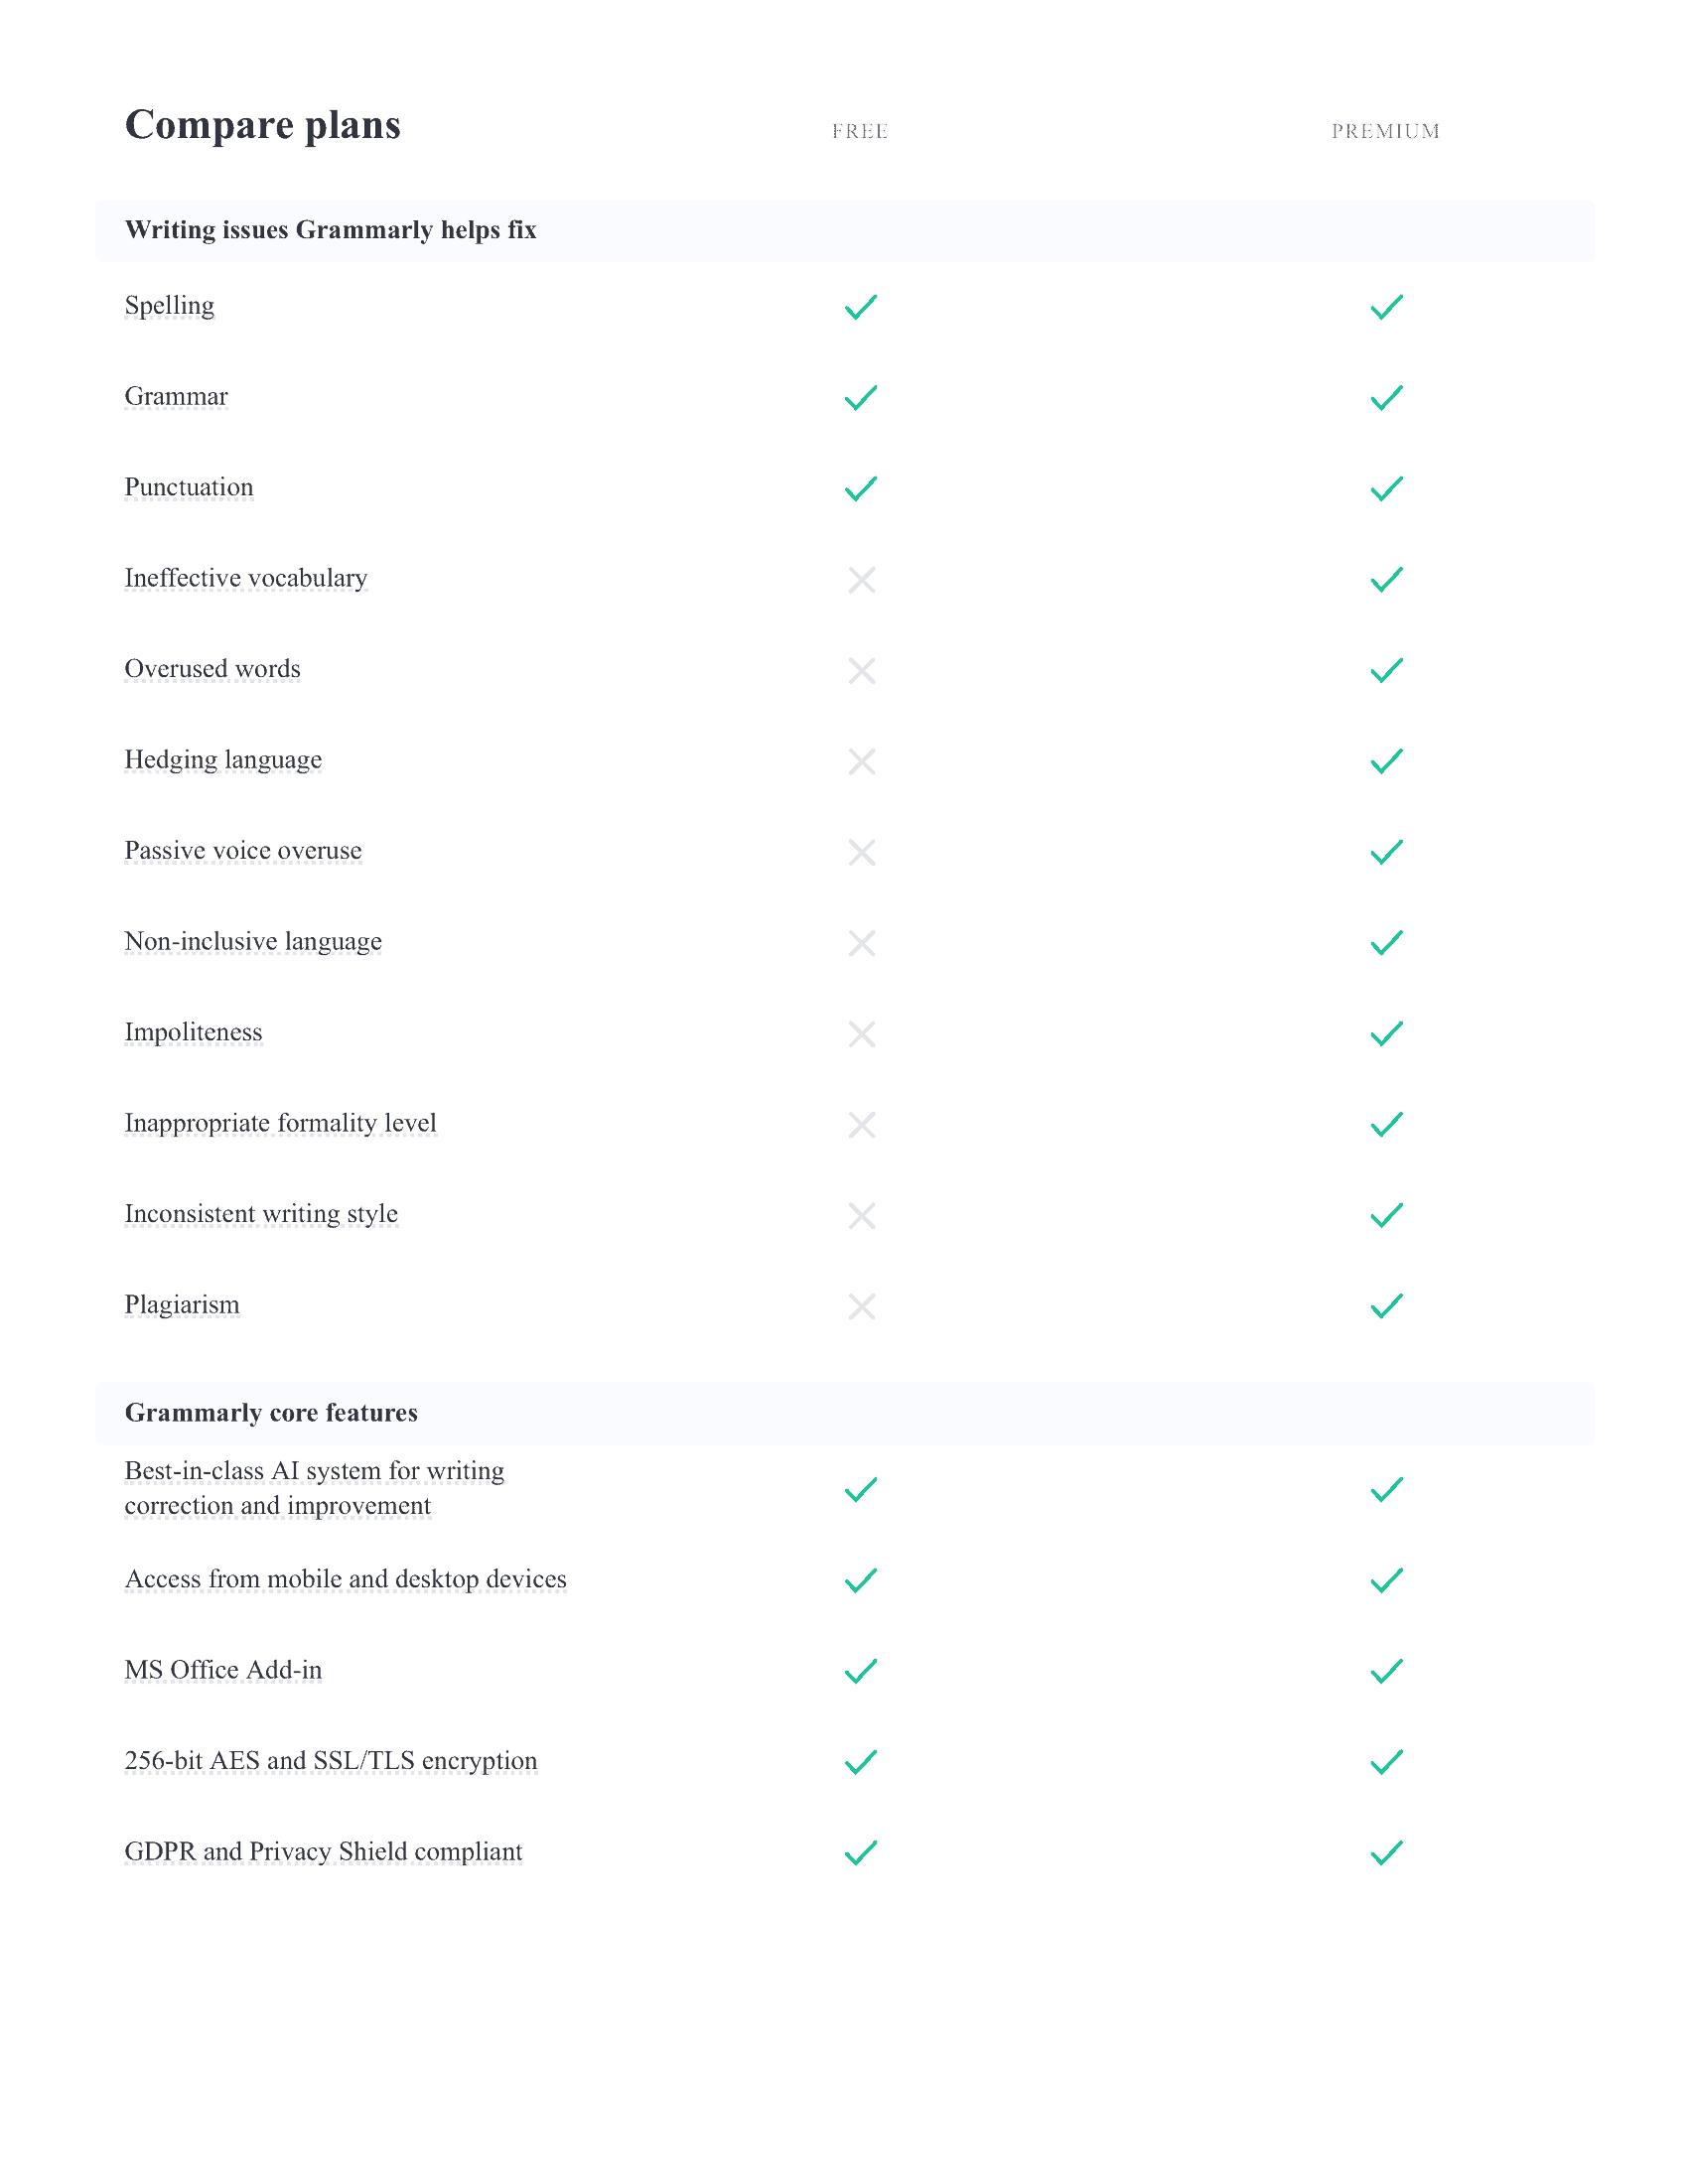 Grammarly Premium Vs Free